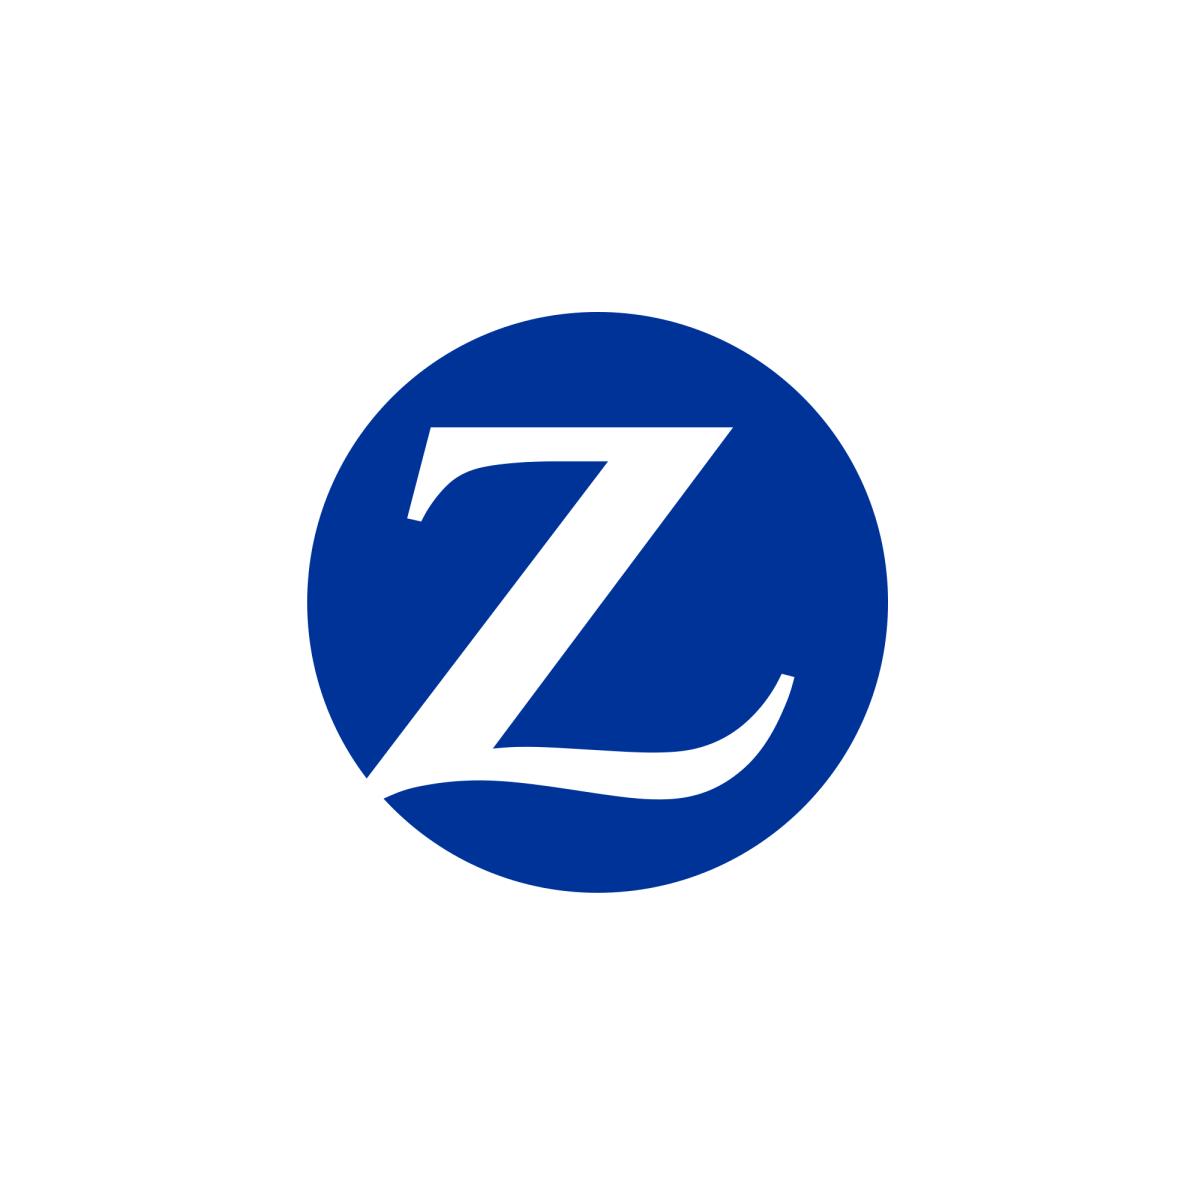 Real Company Logo Letter Z